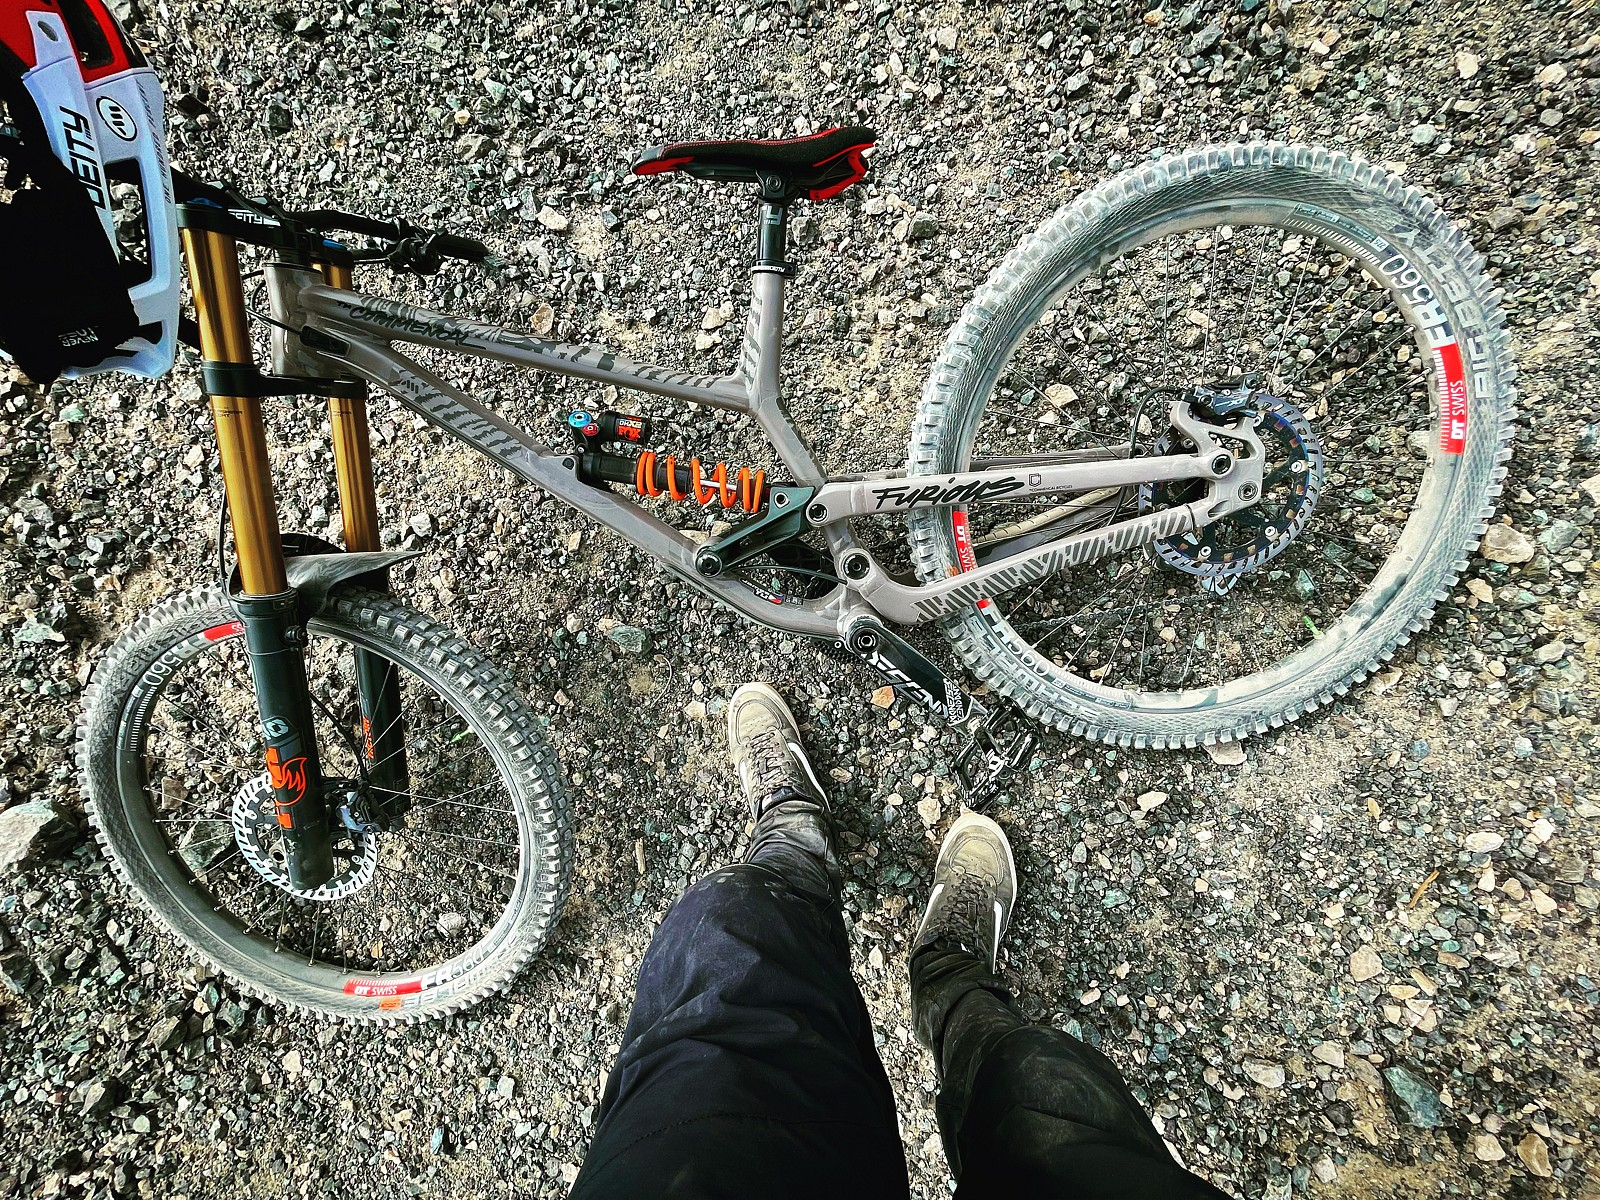 1 - James_Yu_Zeek - Mountain Biking Pictures - Vital MTB